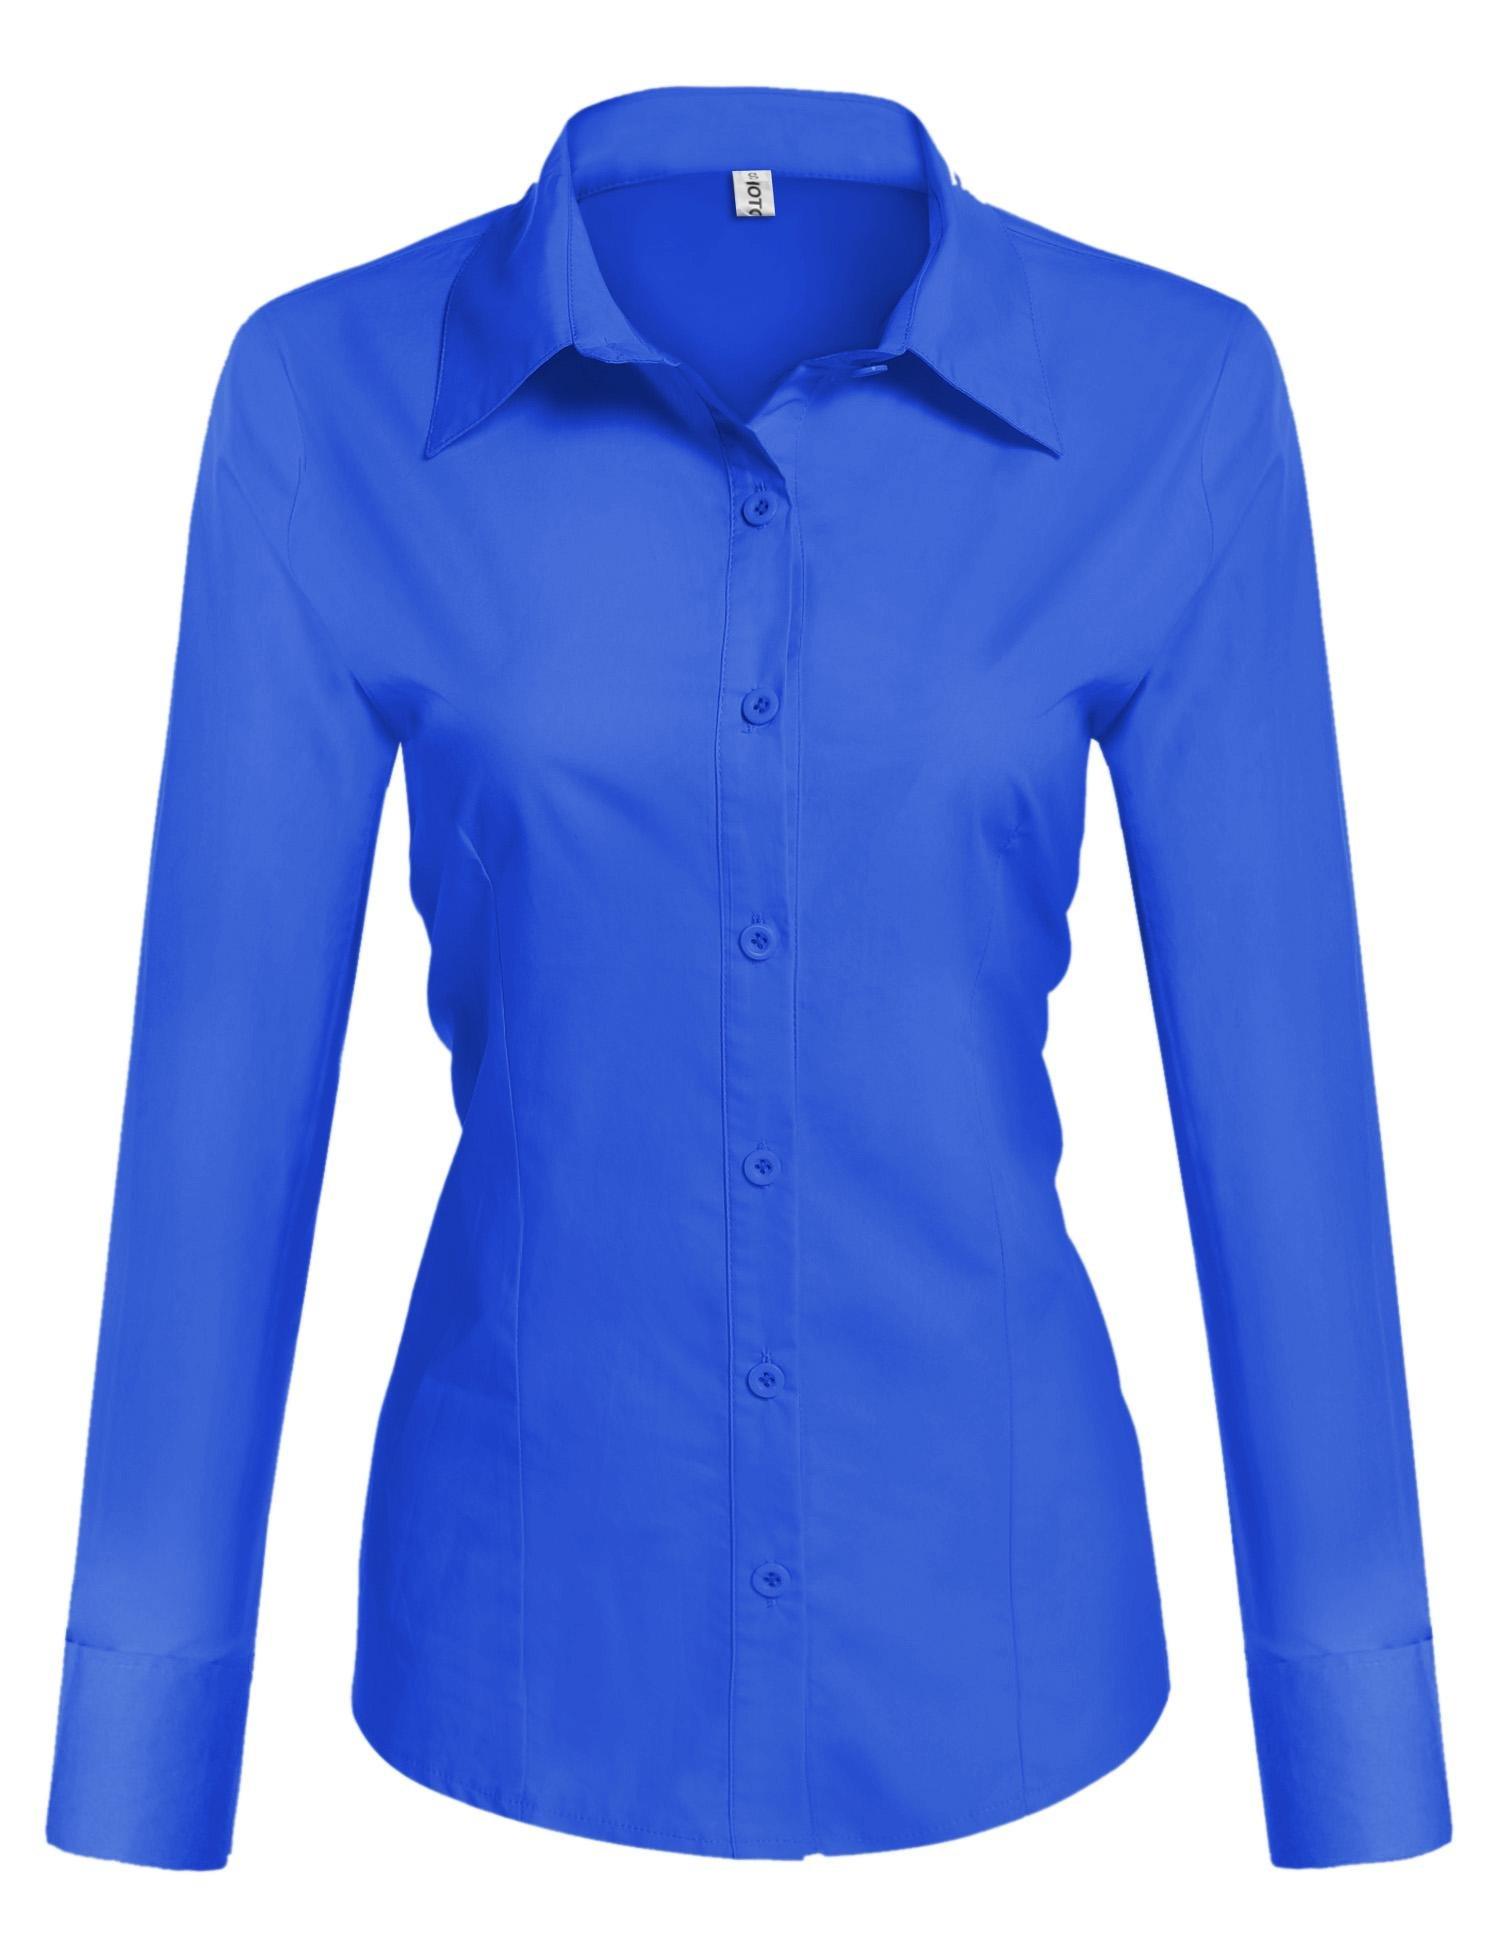 HOTOUCH Women's Collared Button Down Long Sleeve Dress Shirt (Royal Blue M)